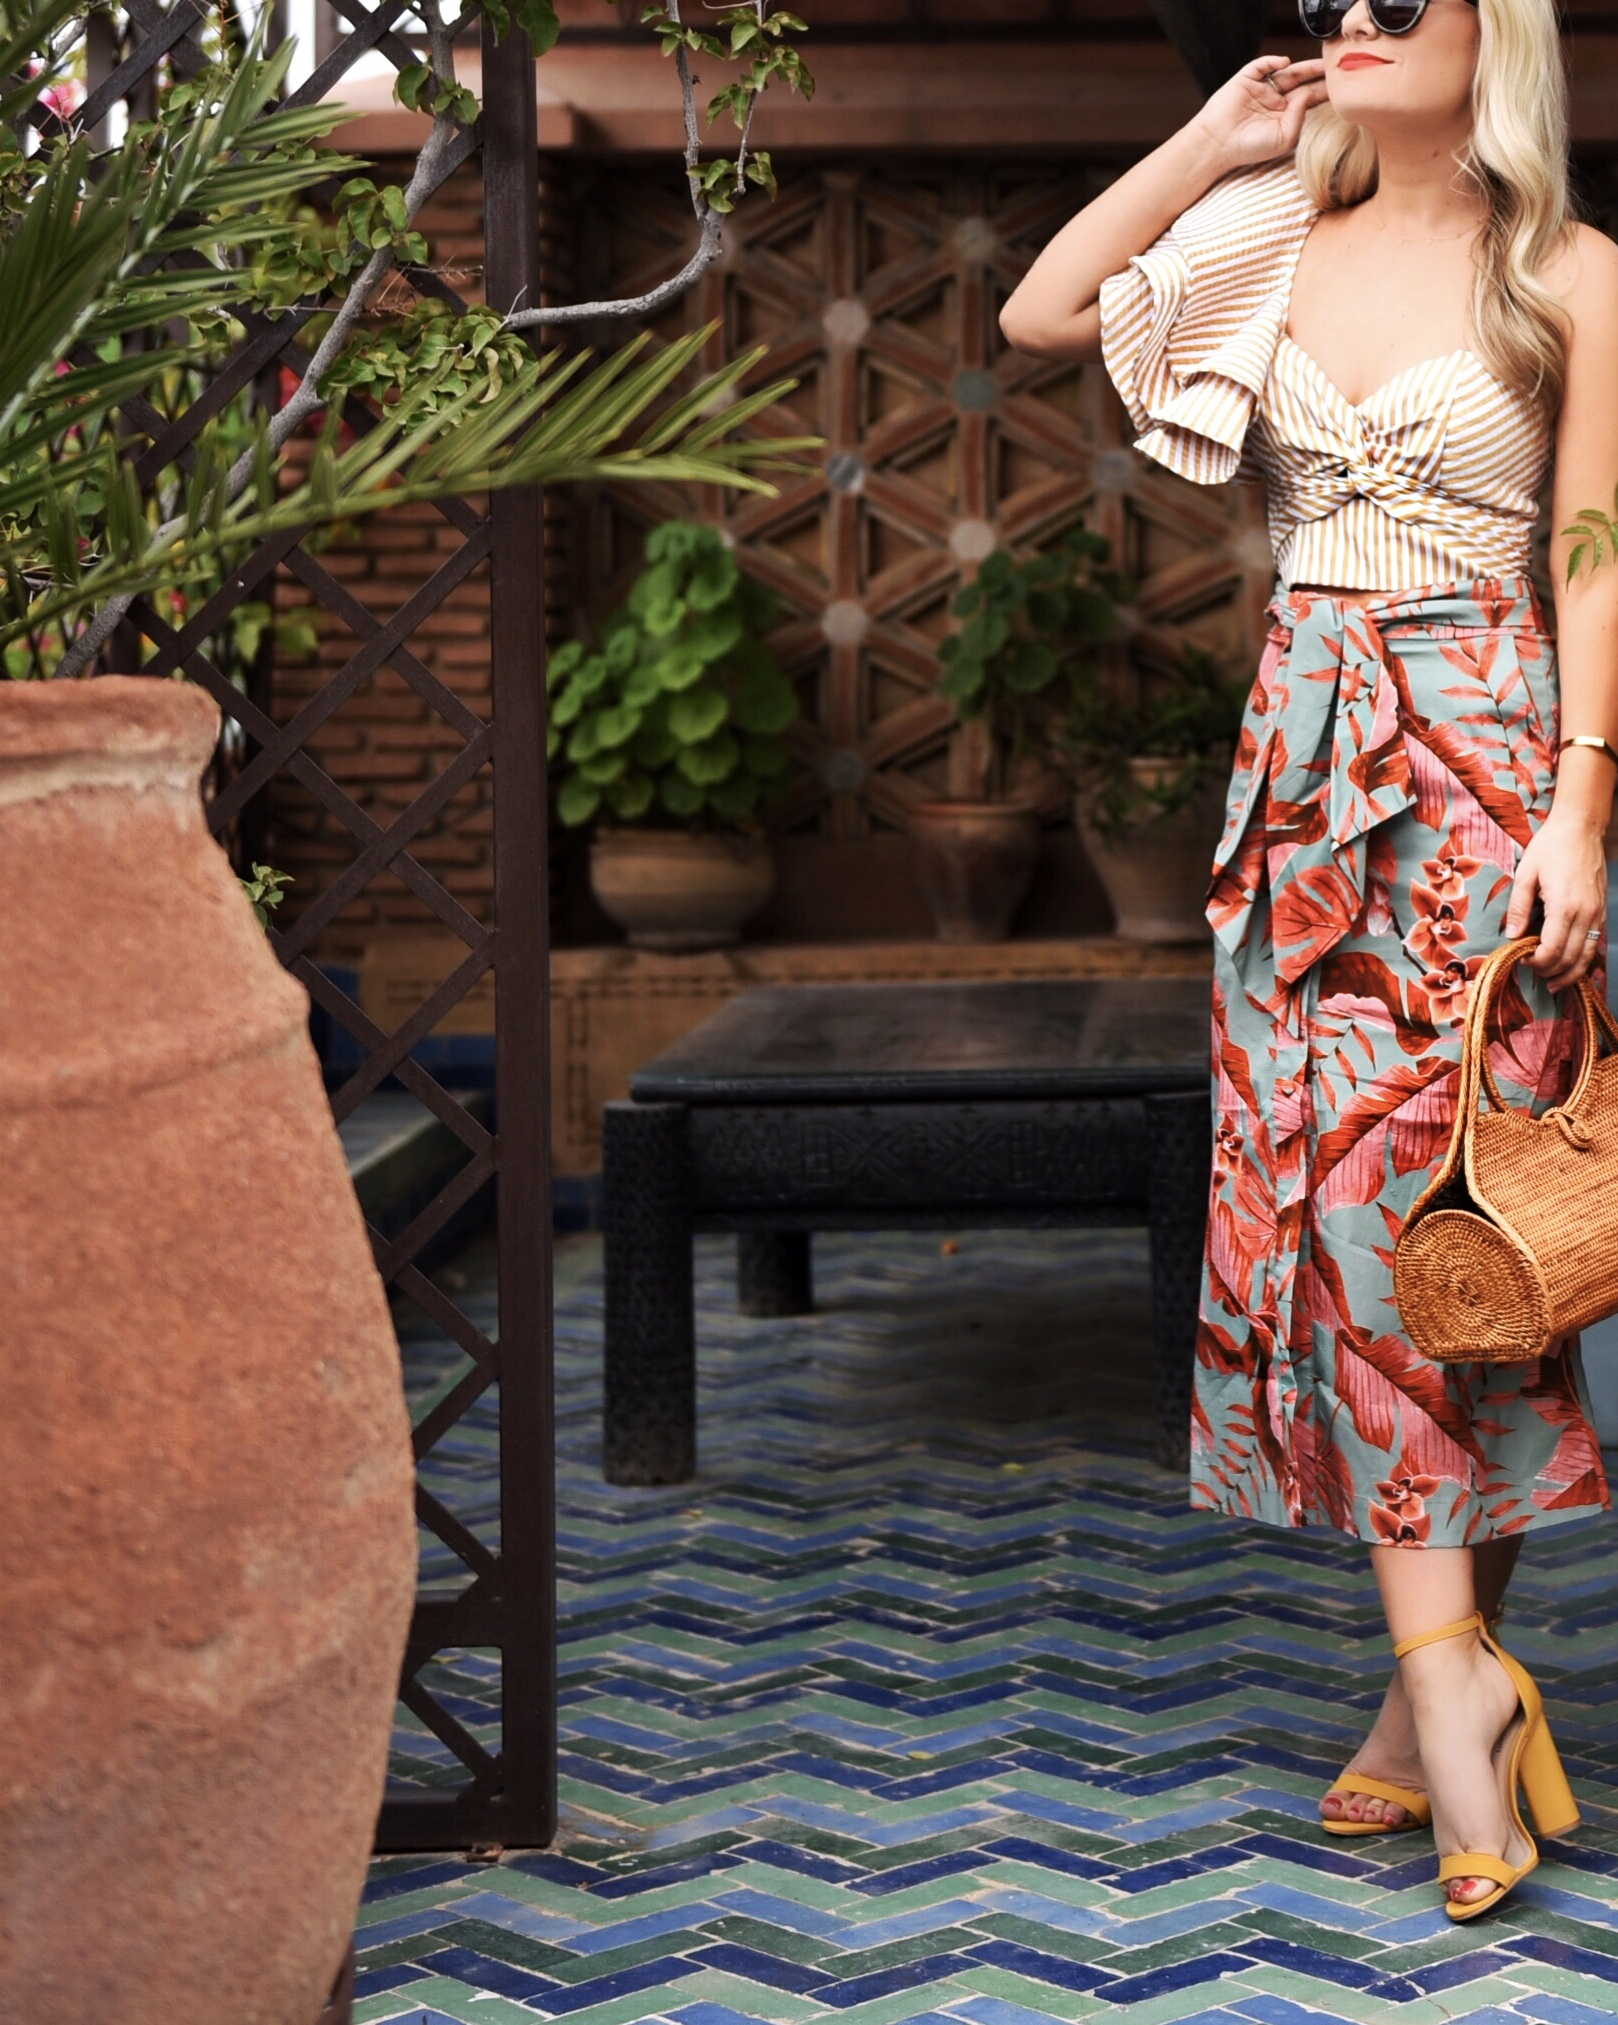 lo-murphy-johanna-ortiz-ruffle-top-printed-midi-skirt-vacation-style-marrakech